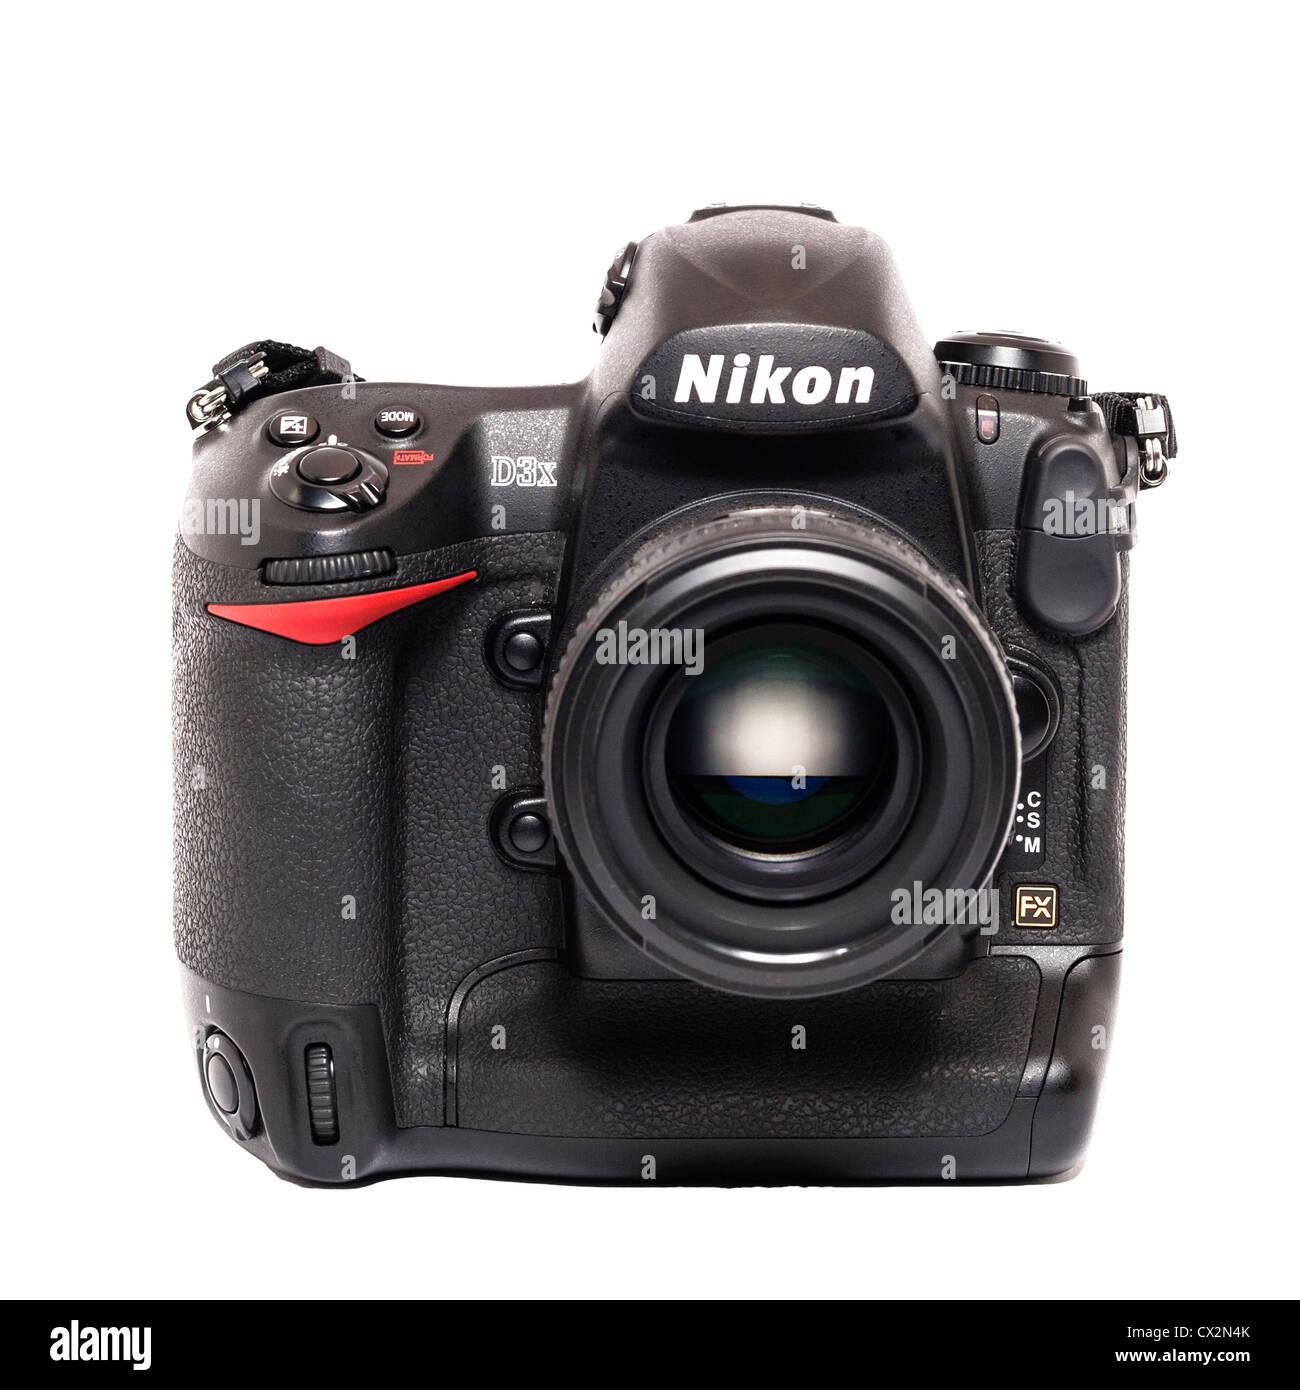 A Nikon D3x flagship model DSLR professional grade digital camera on a white background - Stock Image